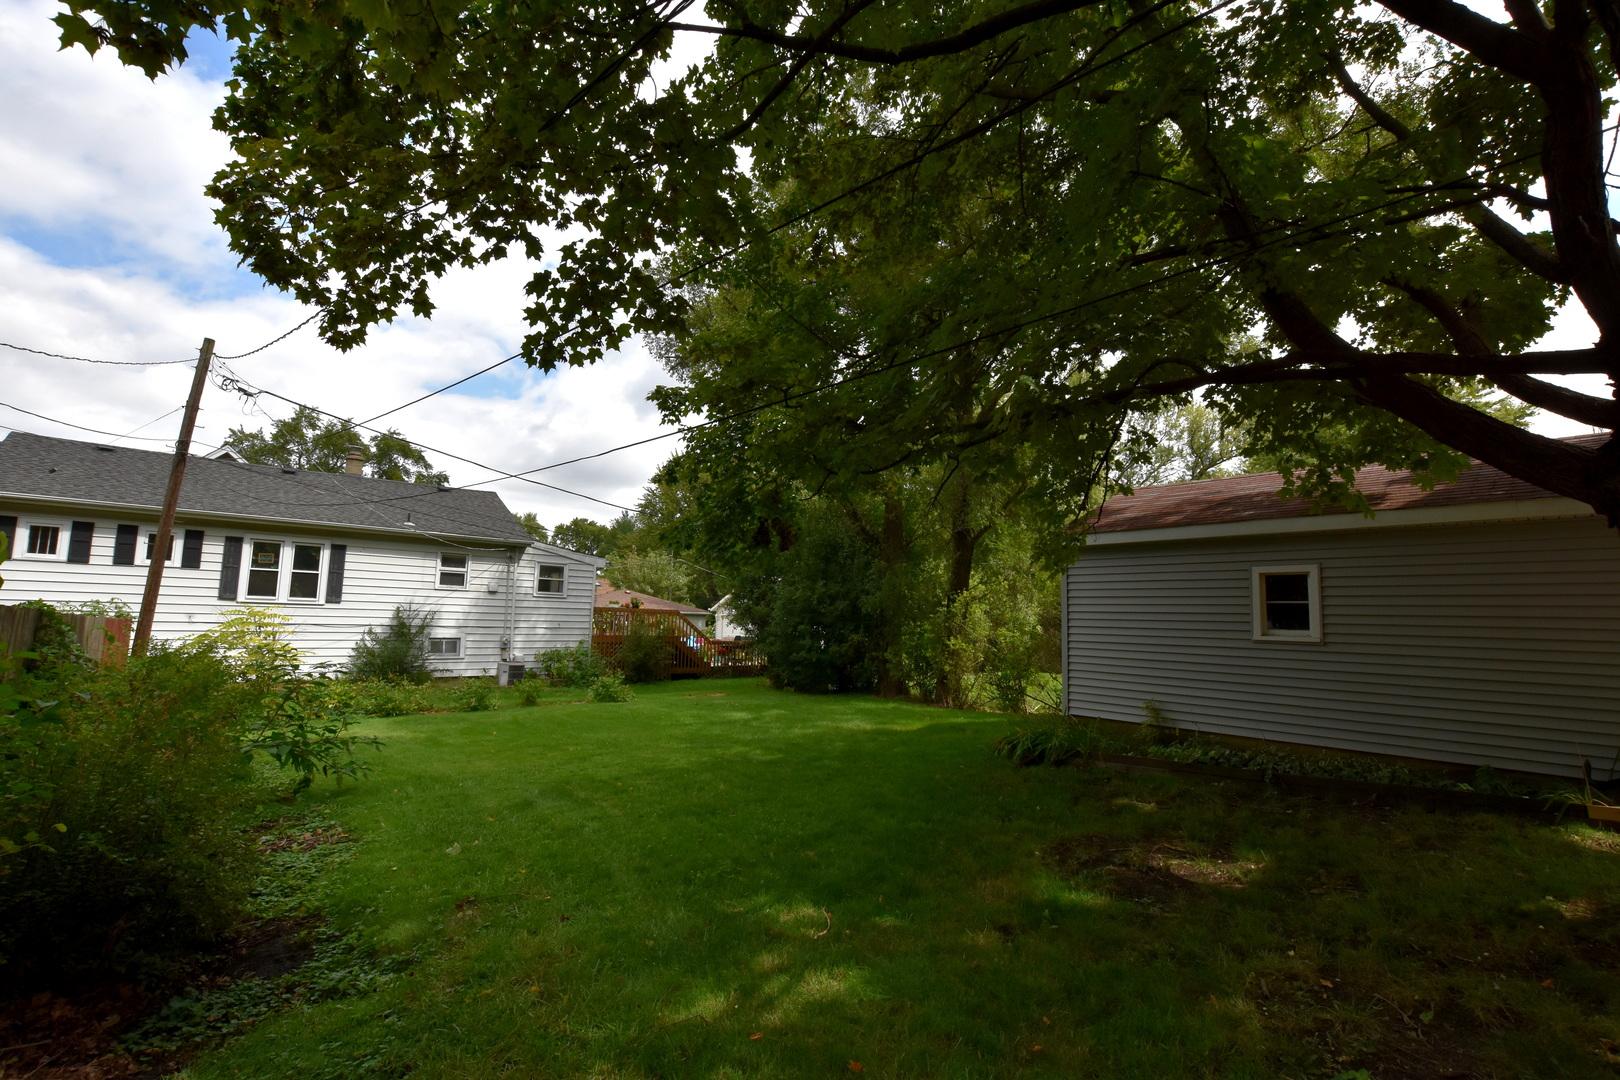 406 E Washington St, Villa Park, IL 60181